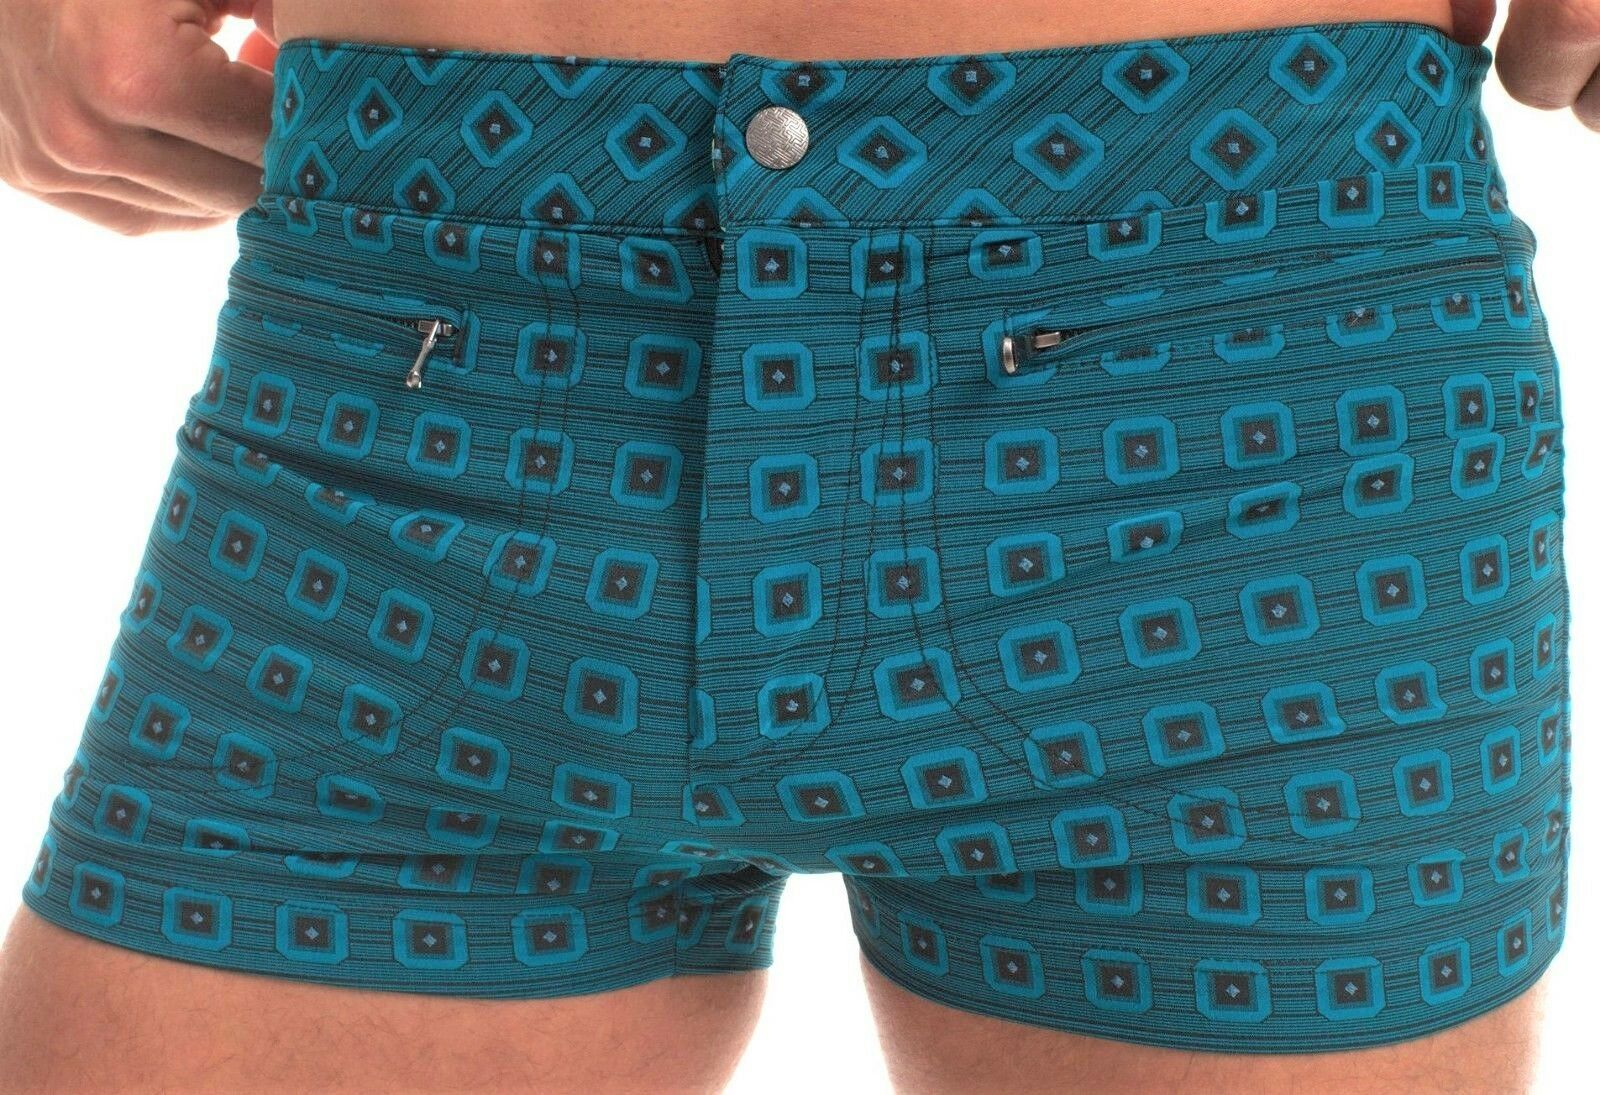 MR TURK 'Jones Beach Vintage Squares Jacquard' Men's Swim Trunks Shorts 30  NWT